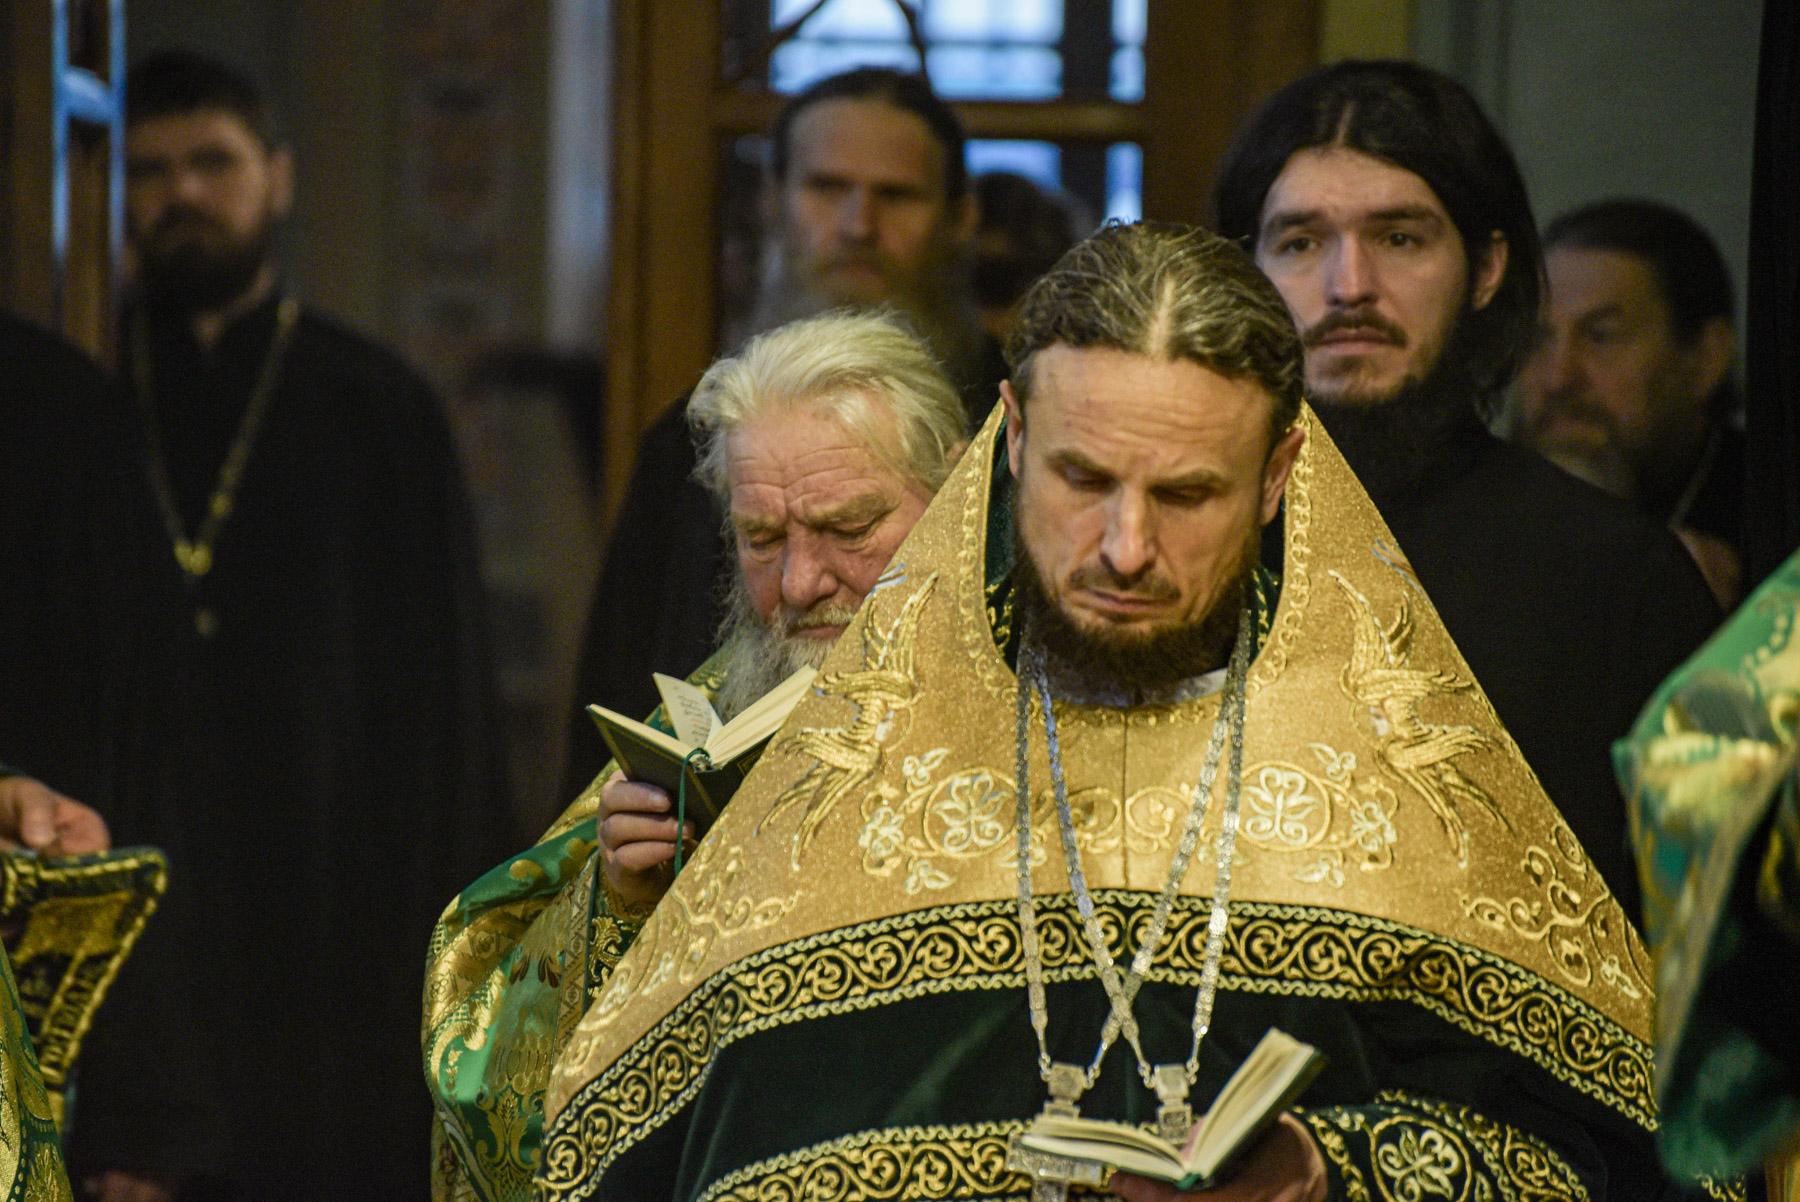 photos of orthodox christmas 0203 2